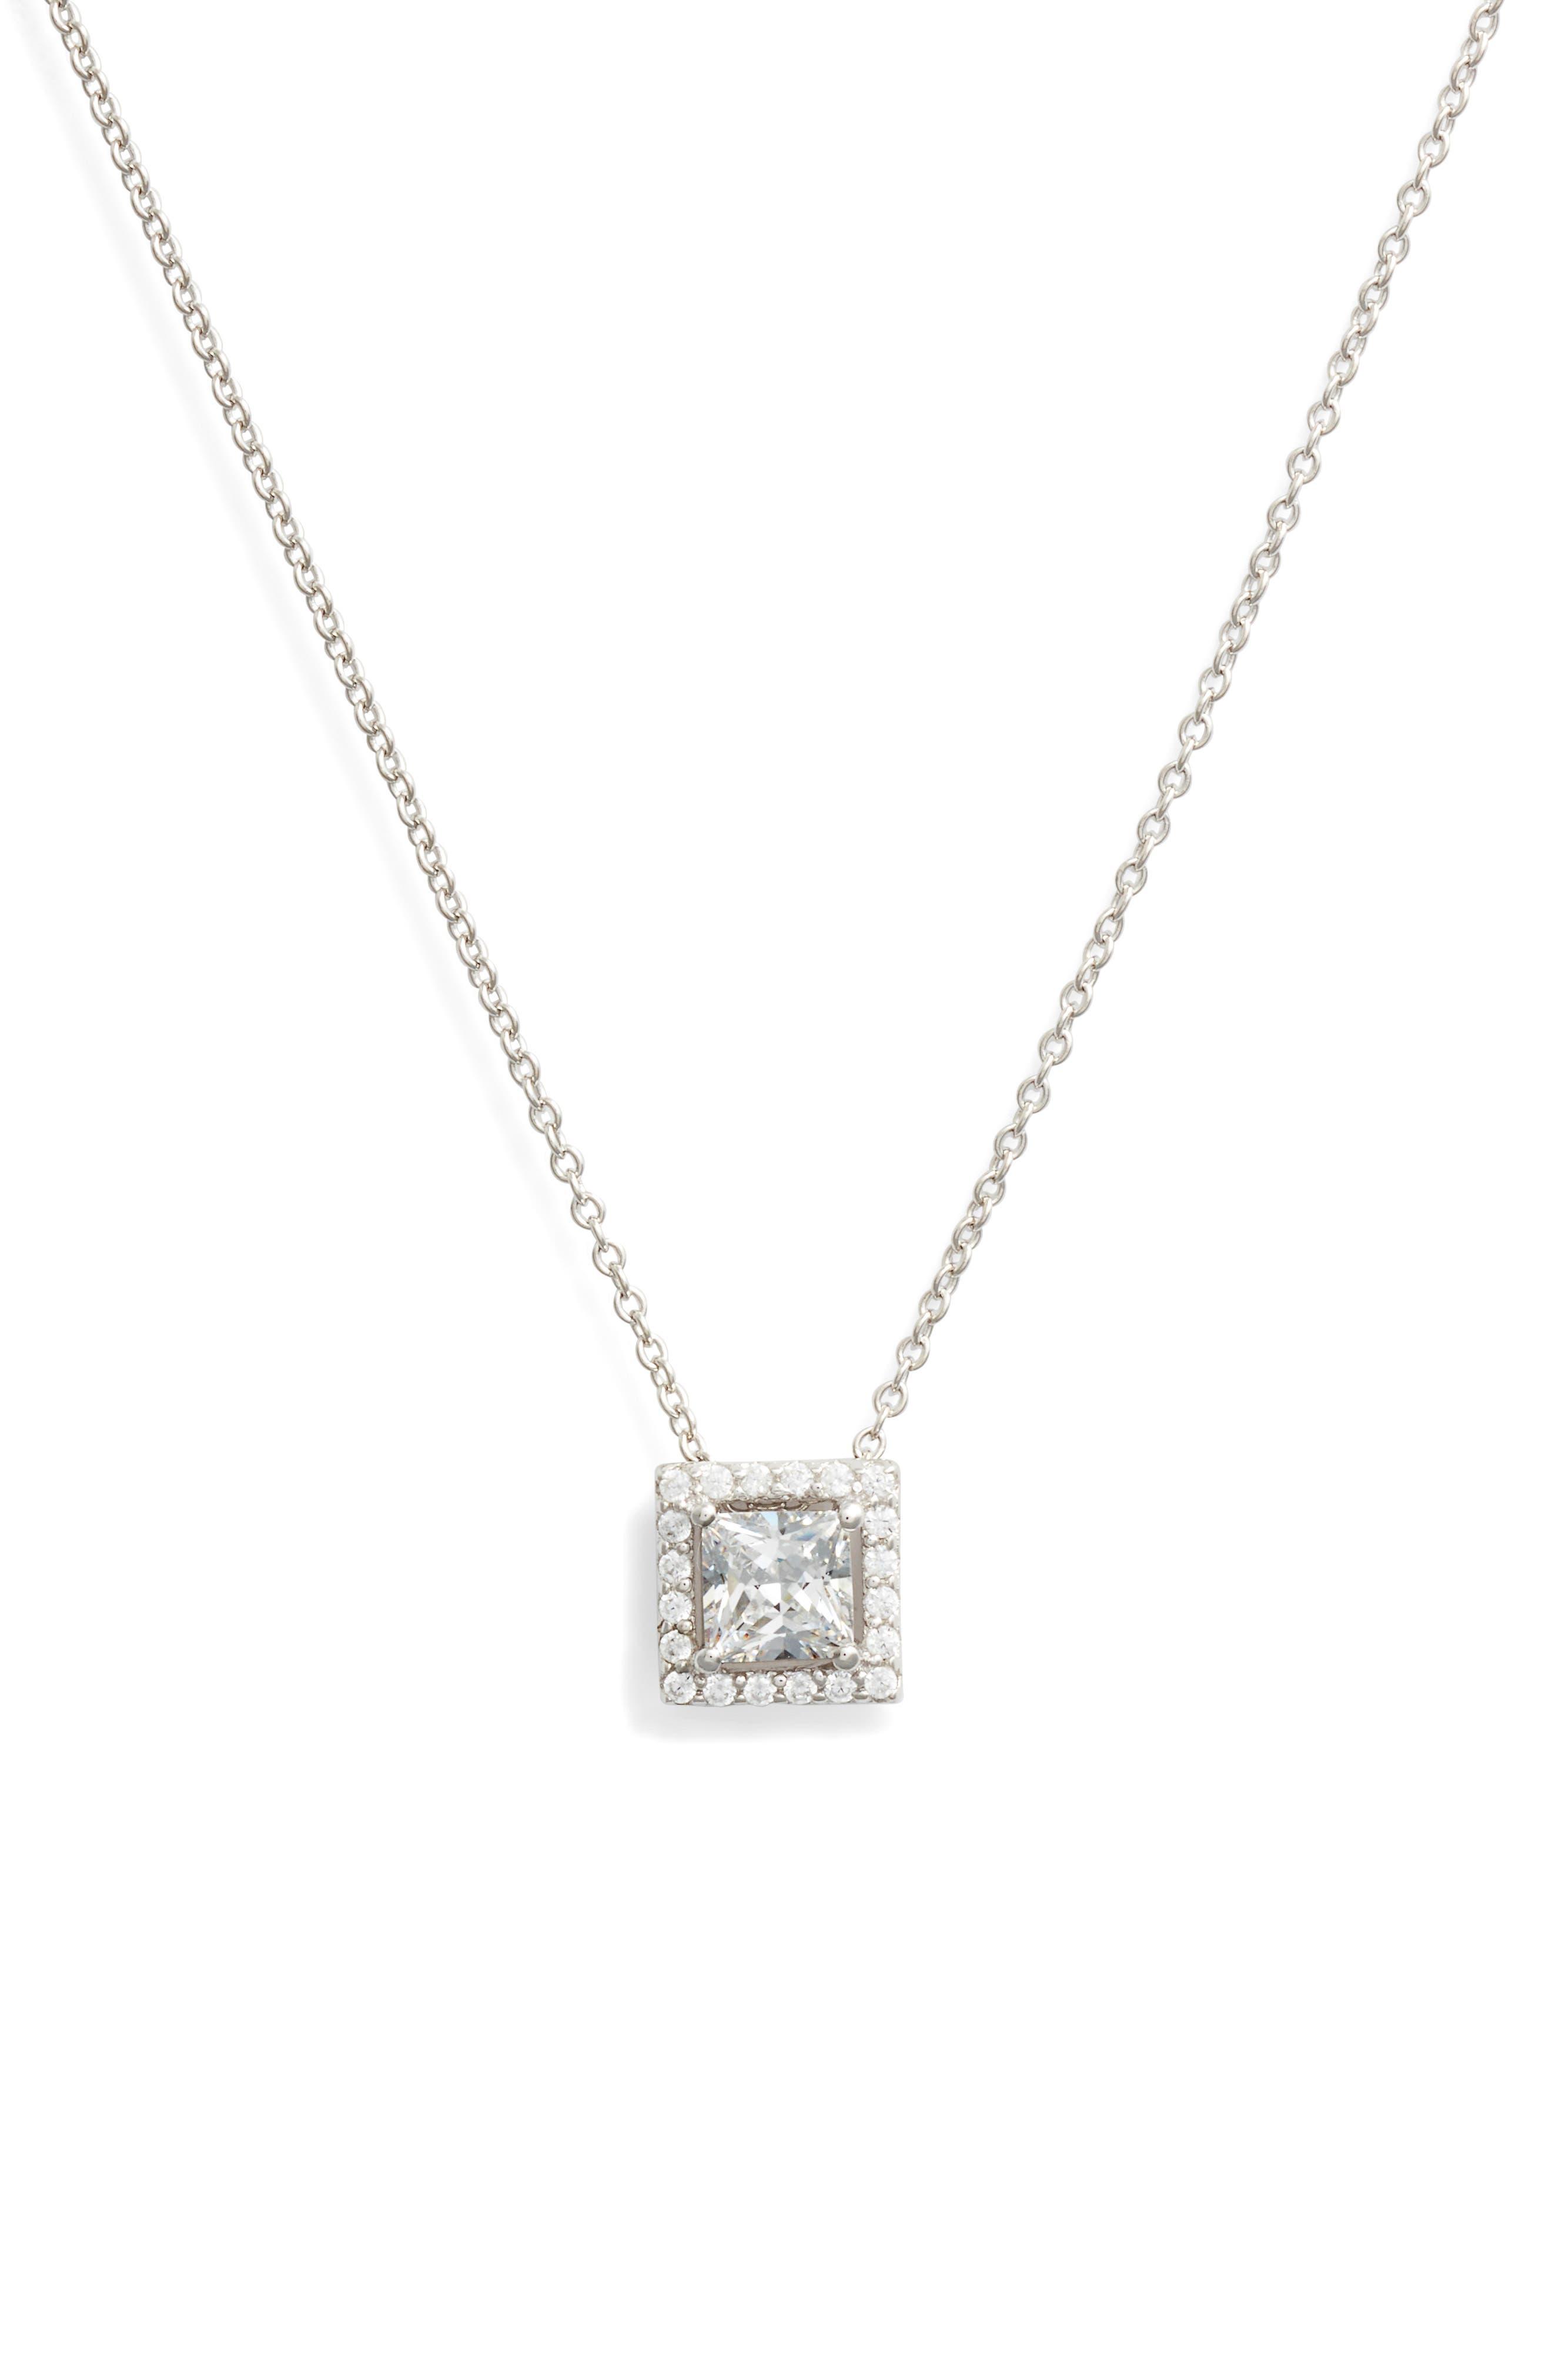 Princess-Cut Halo Necklace,                         Main,                         color, SILVER/ CLEAR